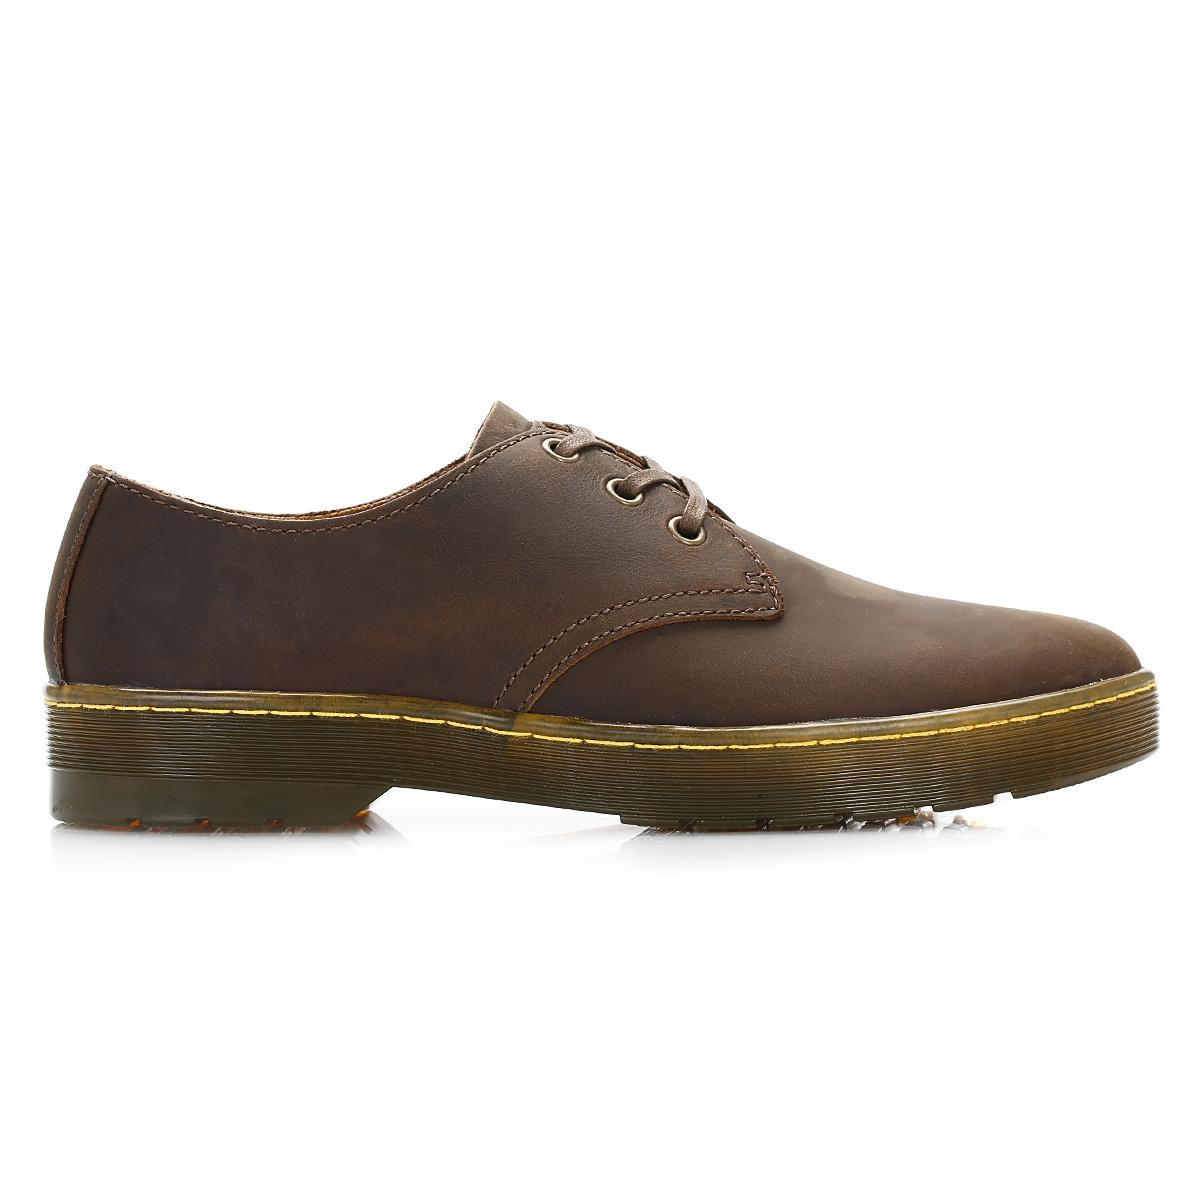 dr martens mens brown leather derby shoes lace up smart casual docs. Black Bedroom Furniture Sets. Home Design Ideas